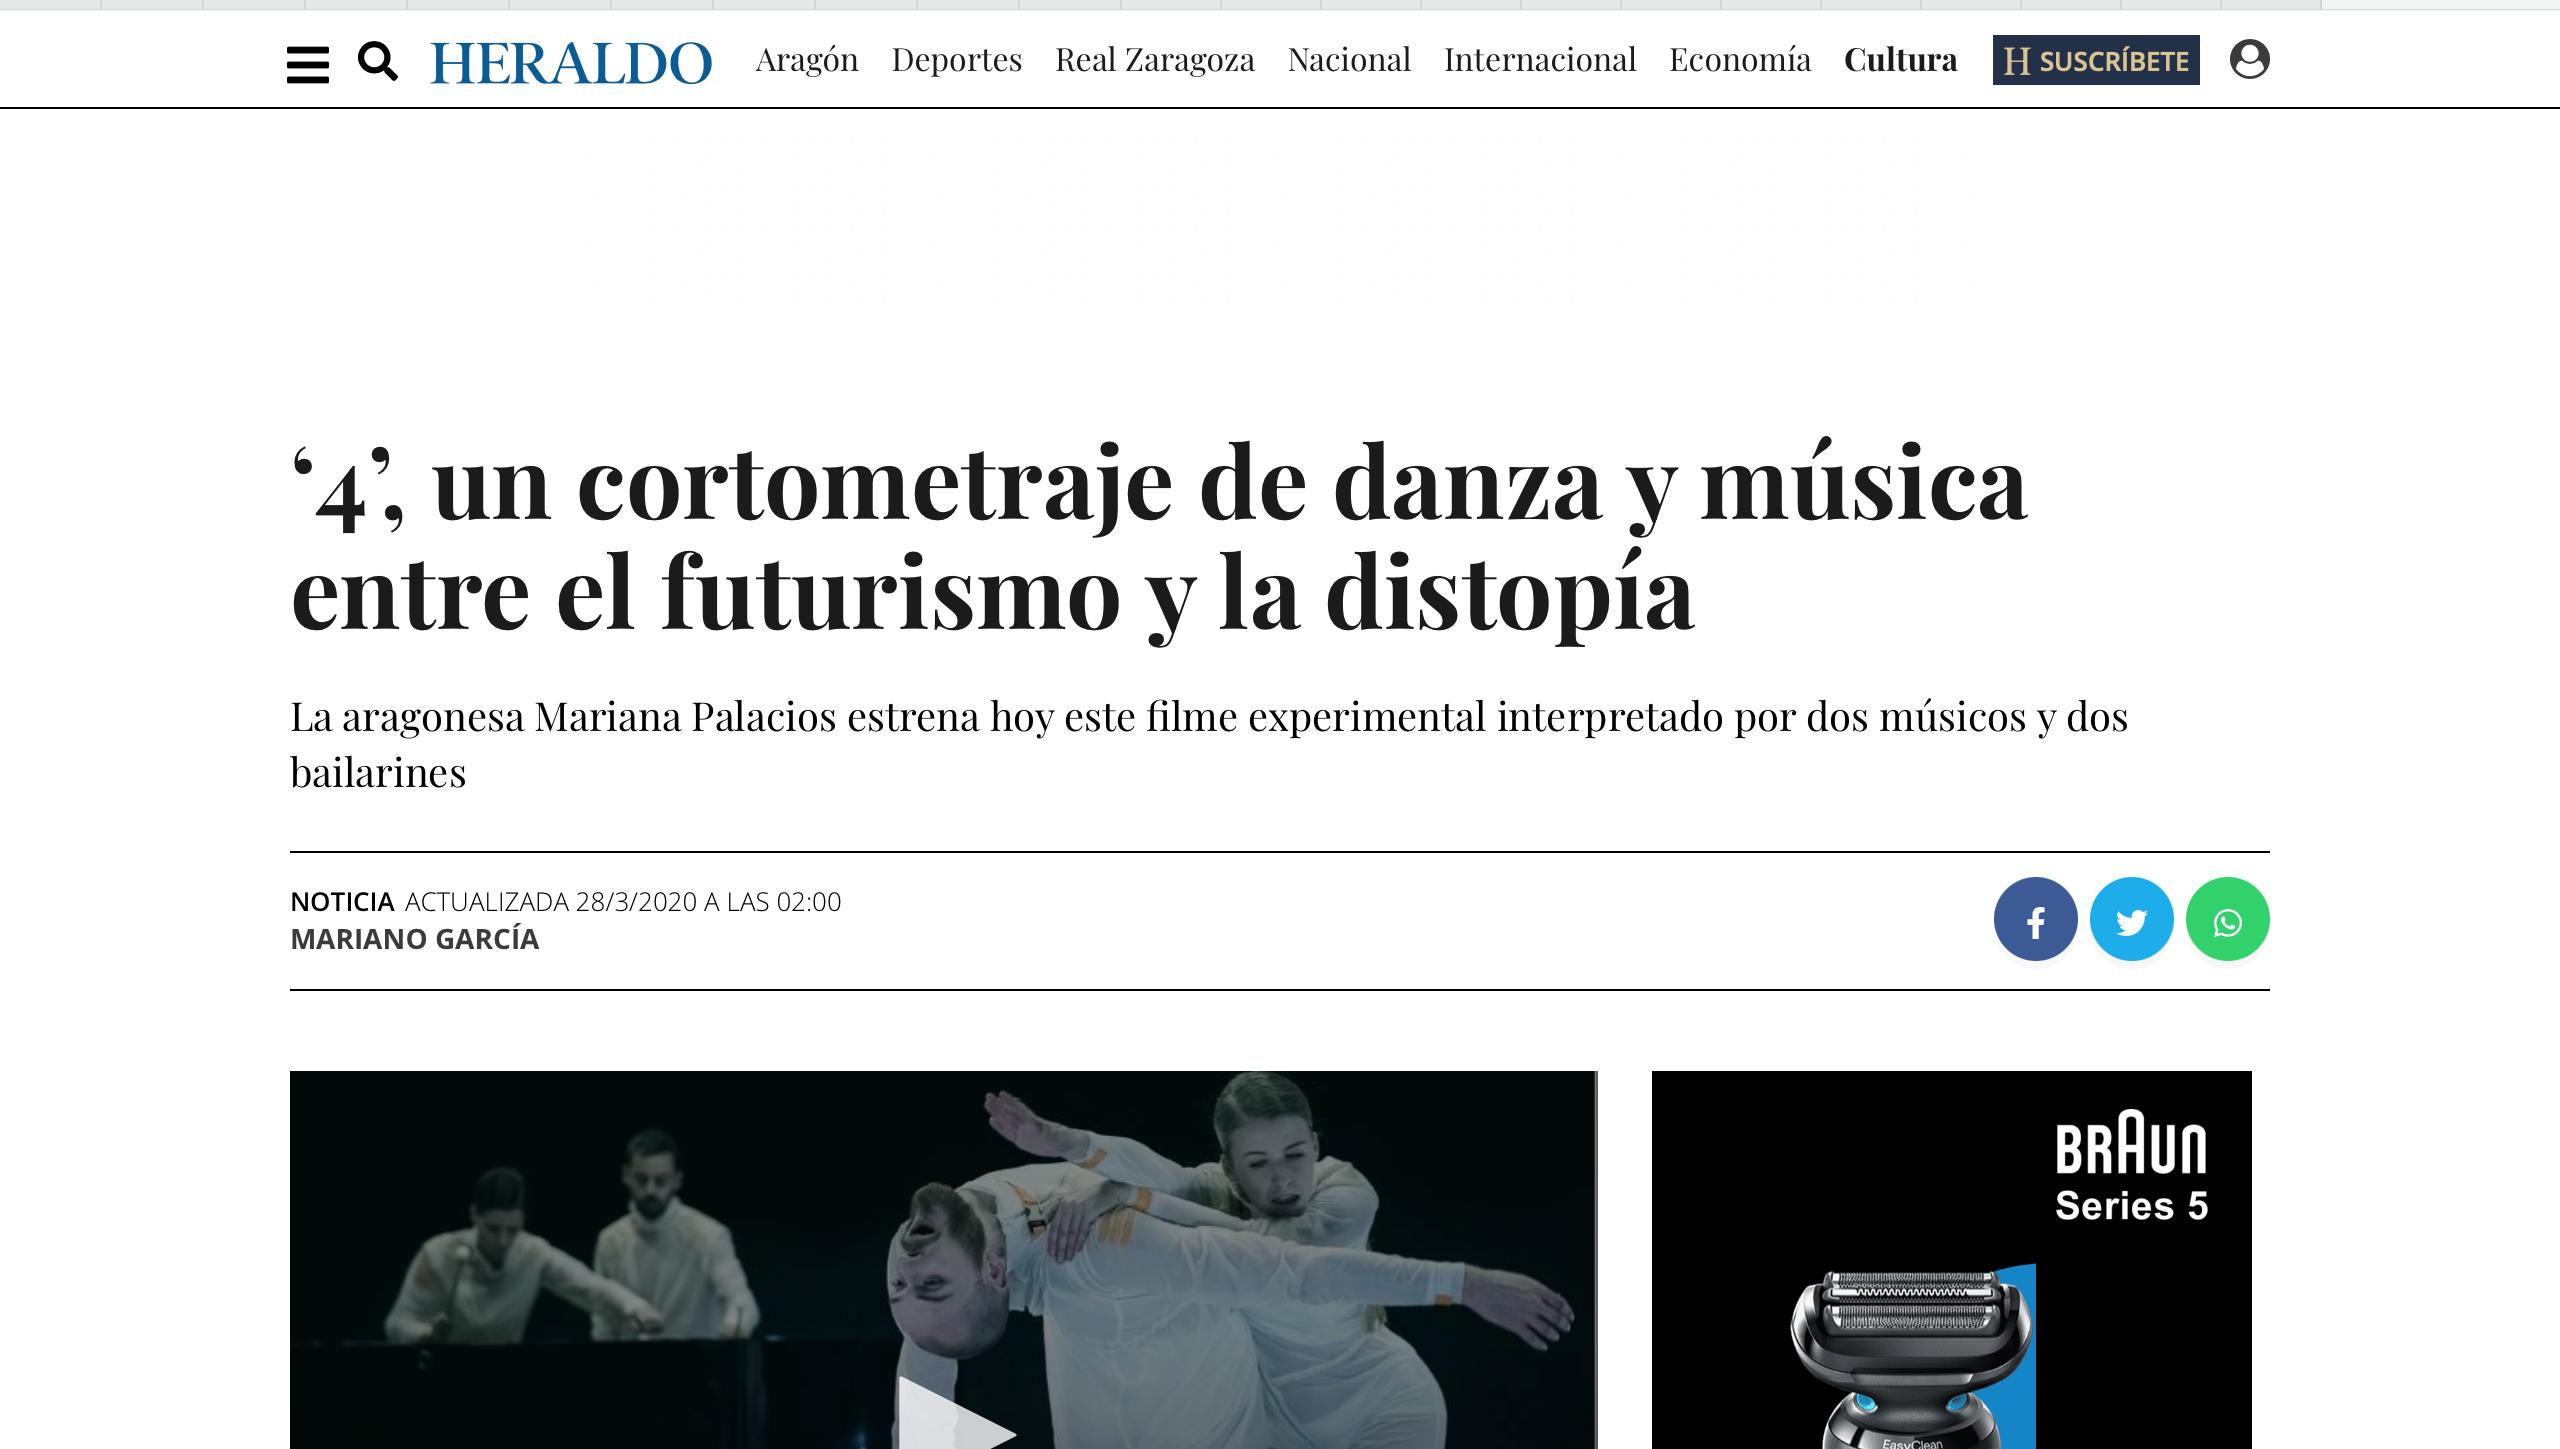 Heraldo 1 Screenshot 2021-05-02 at 20.18.26